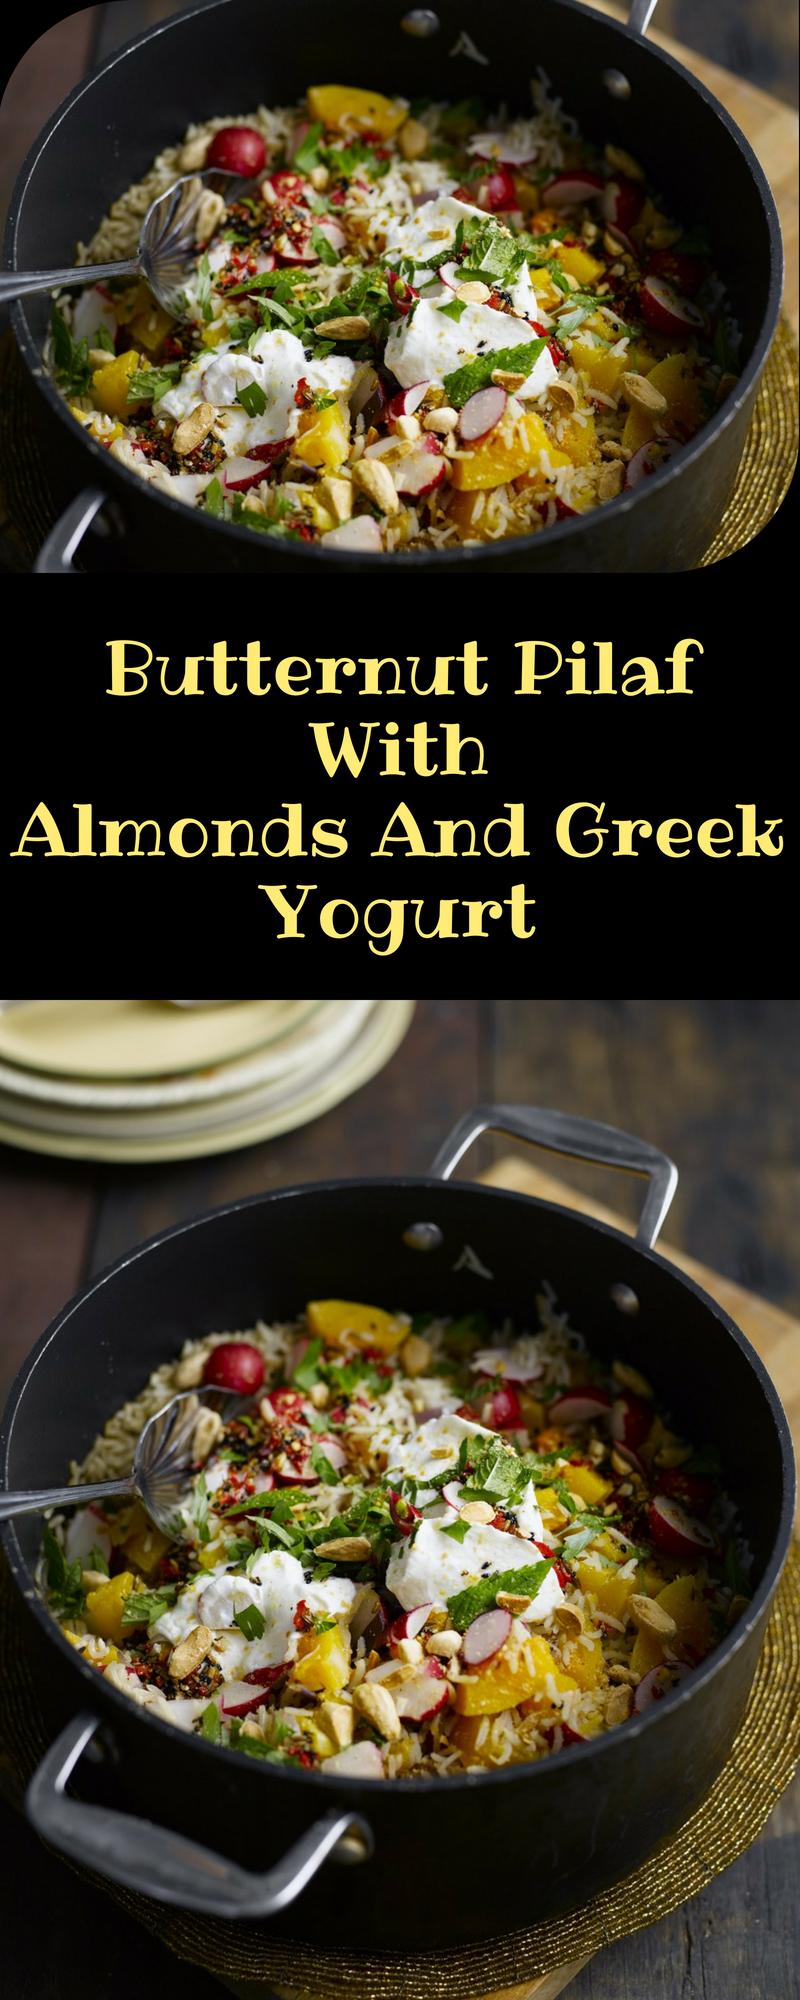 Butternut Pilaf With Almonds And Greek Yogurt